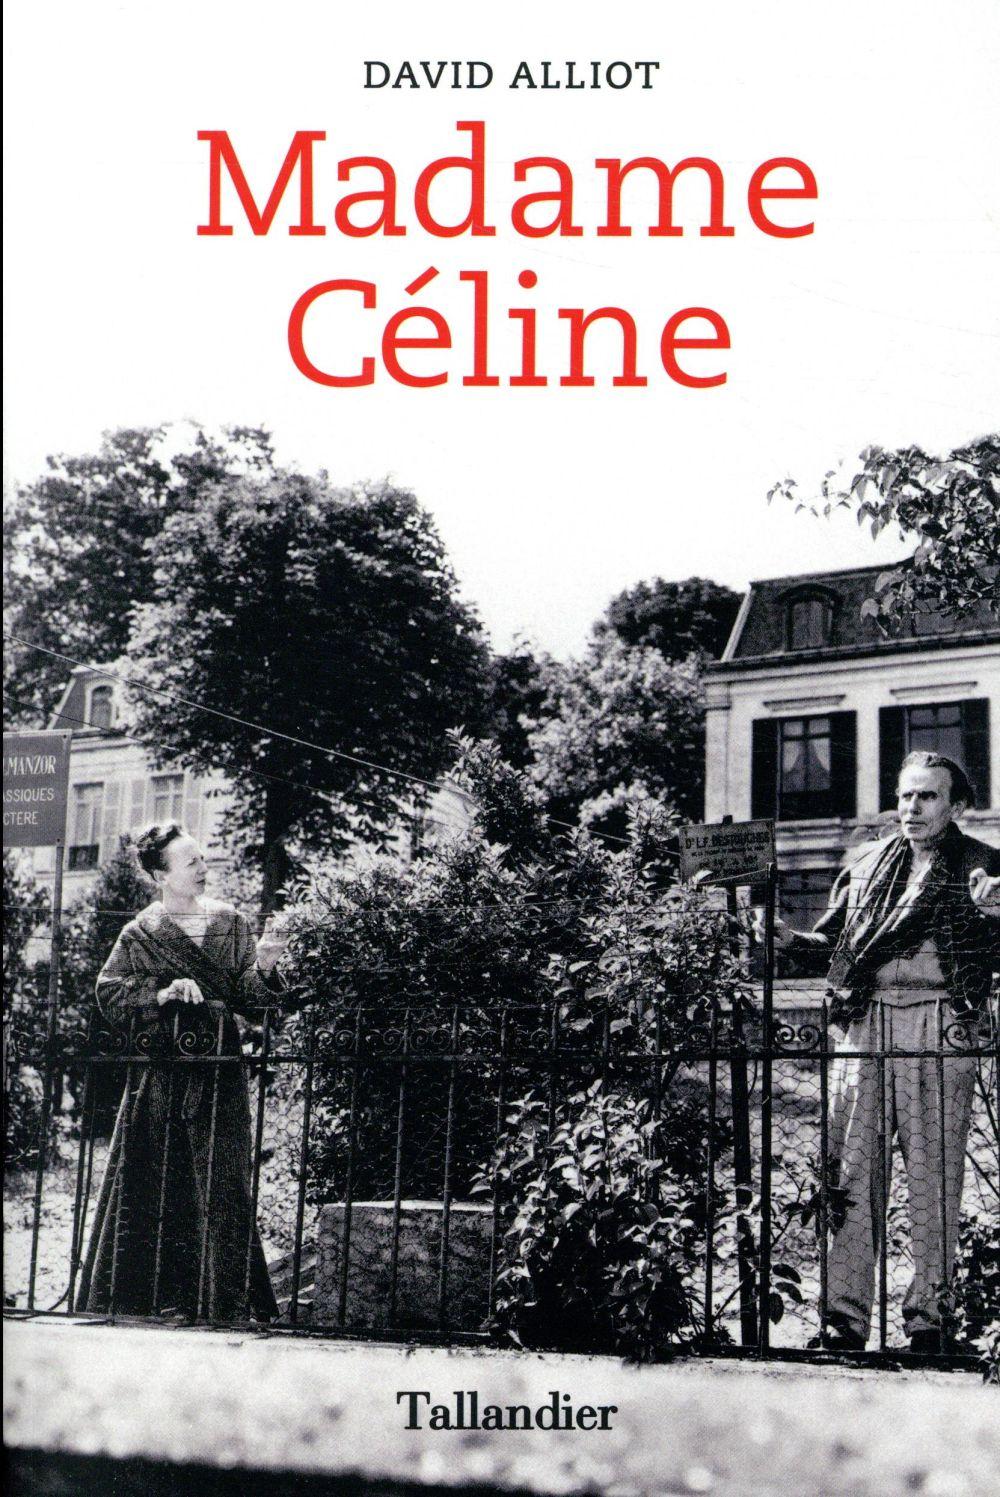 MADAME CELINE